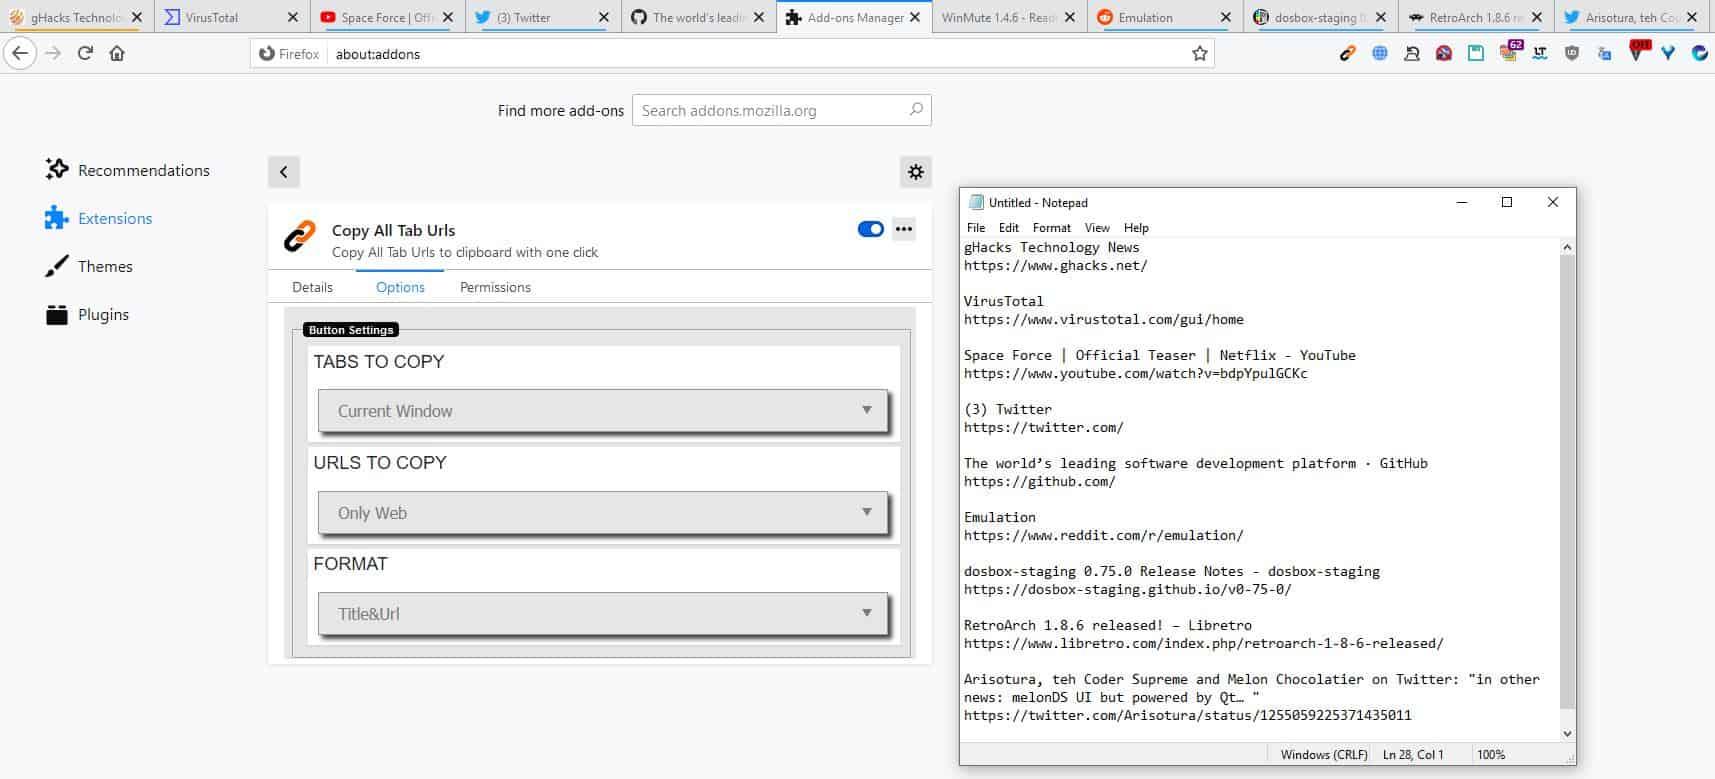 Copy All Tab URLs example